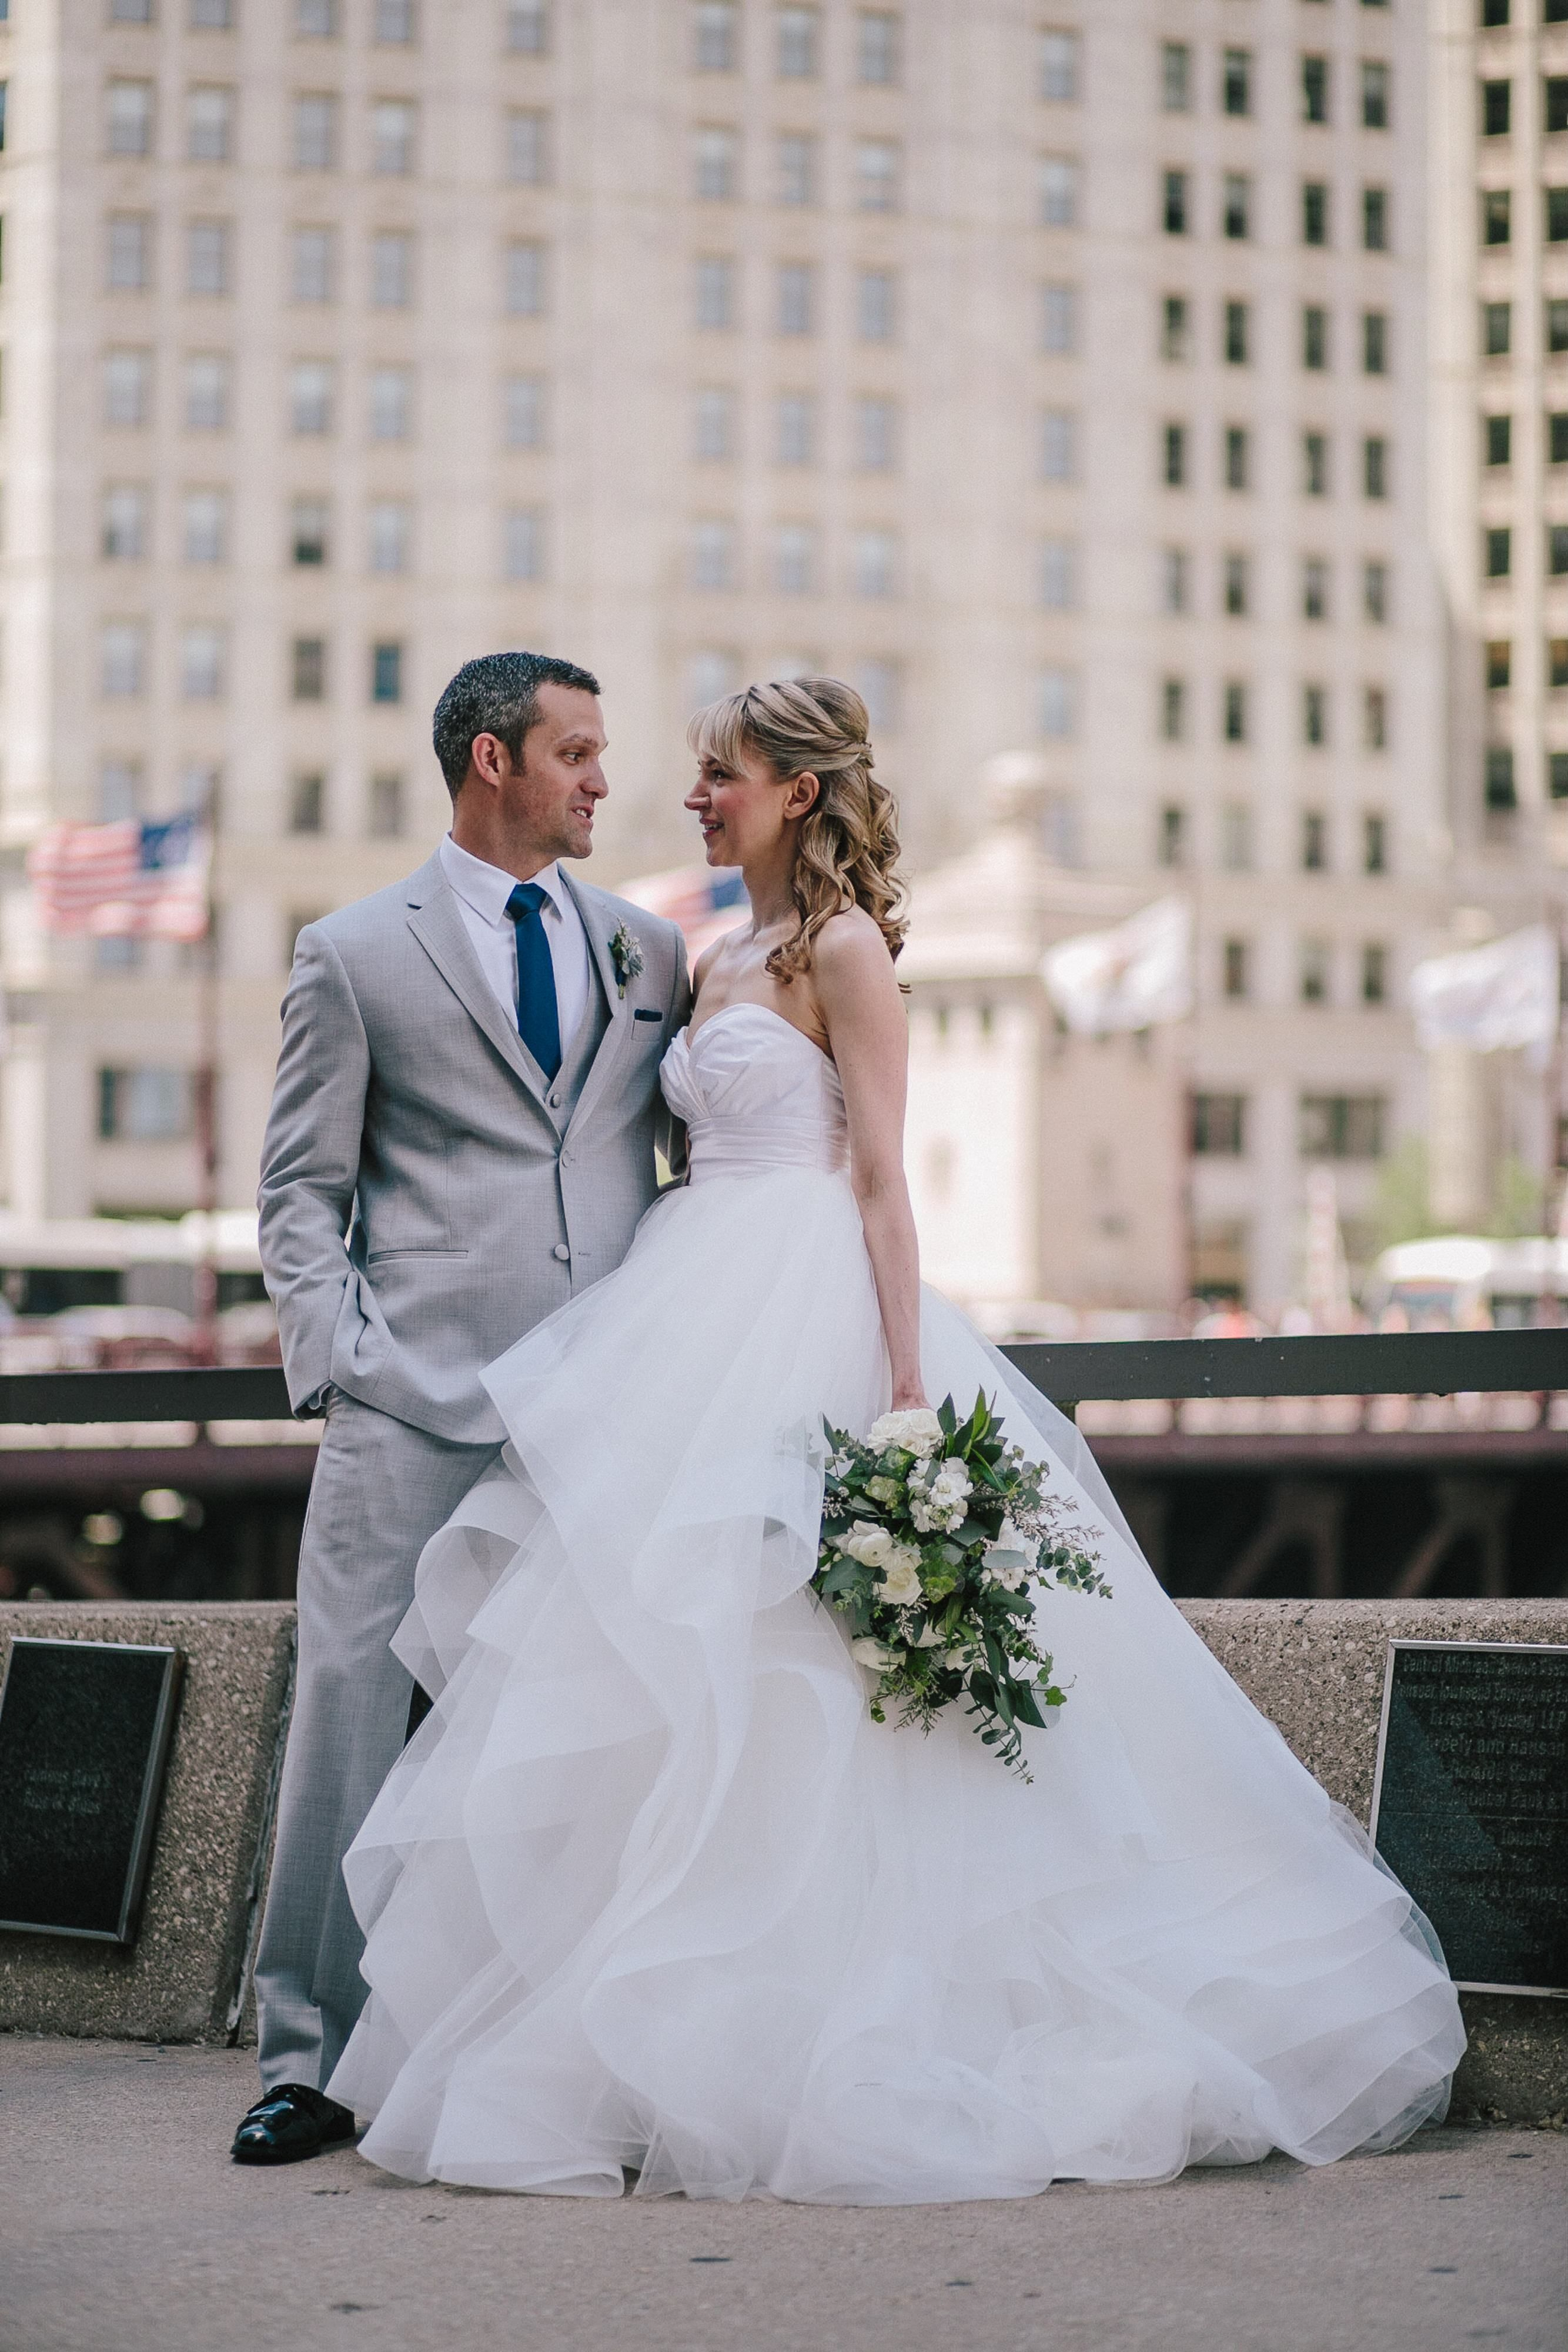 Hayley paige ulondynu hayley paige romantic weddings and wedding